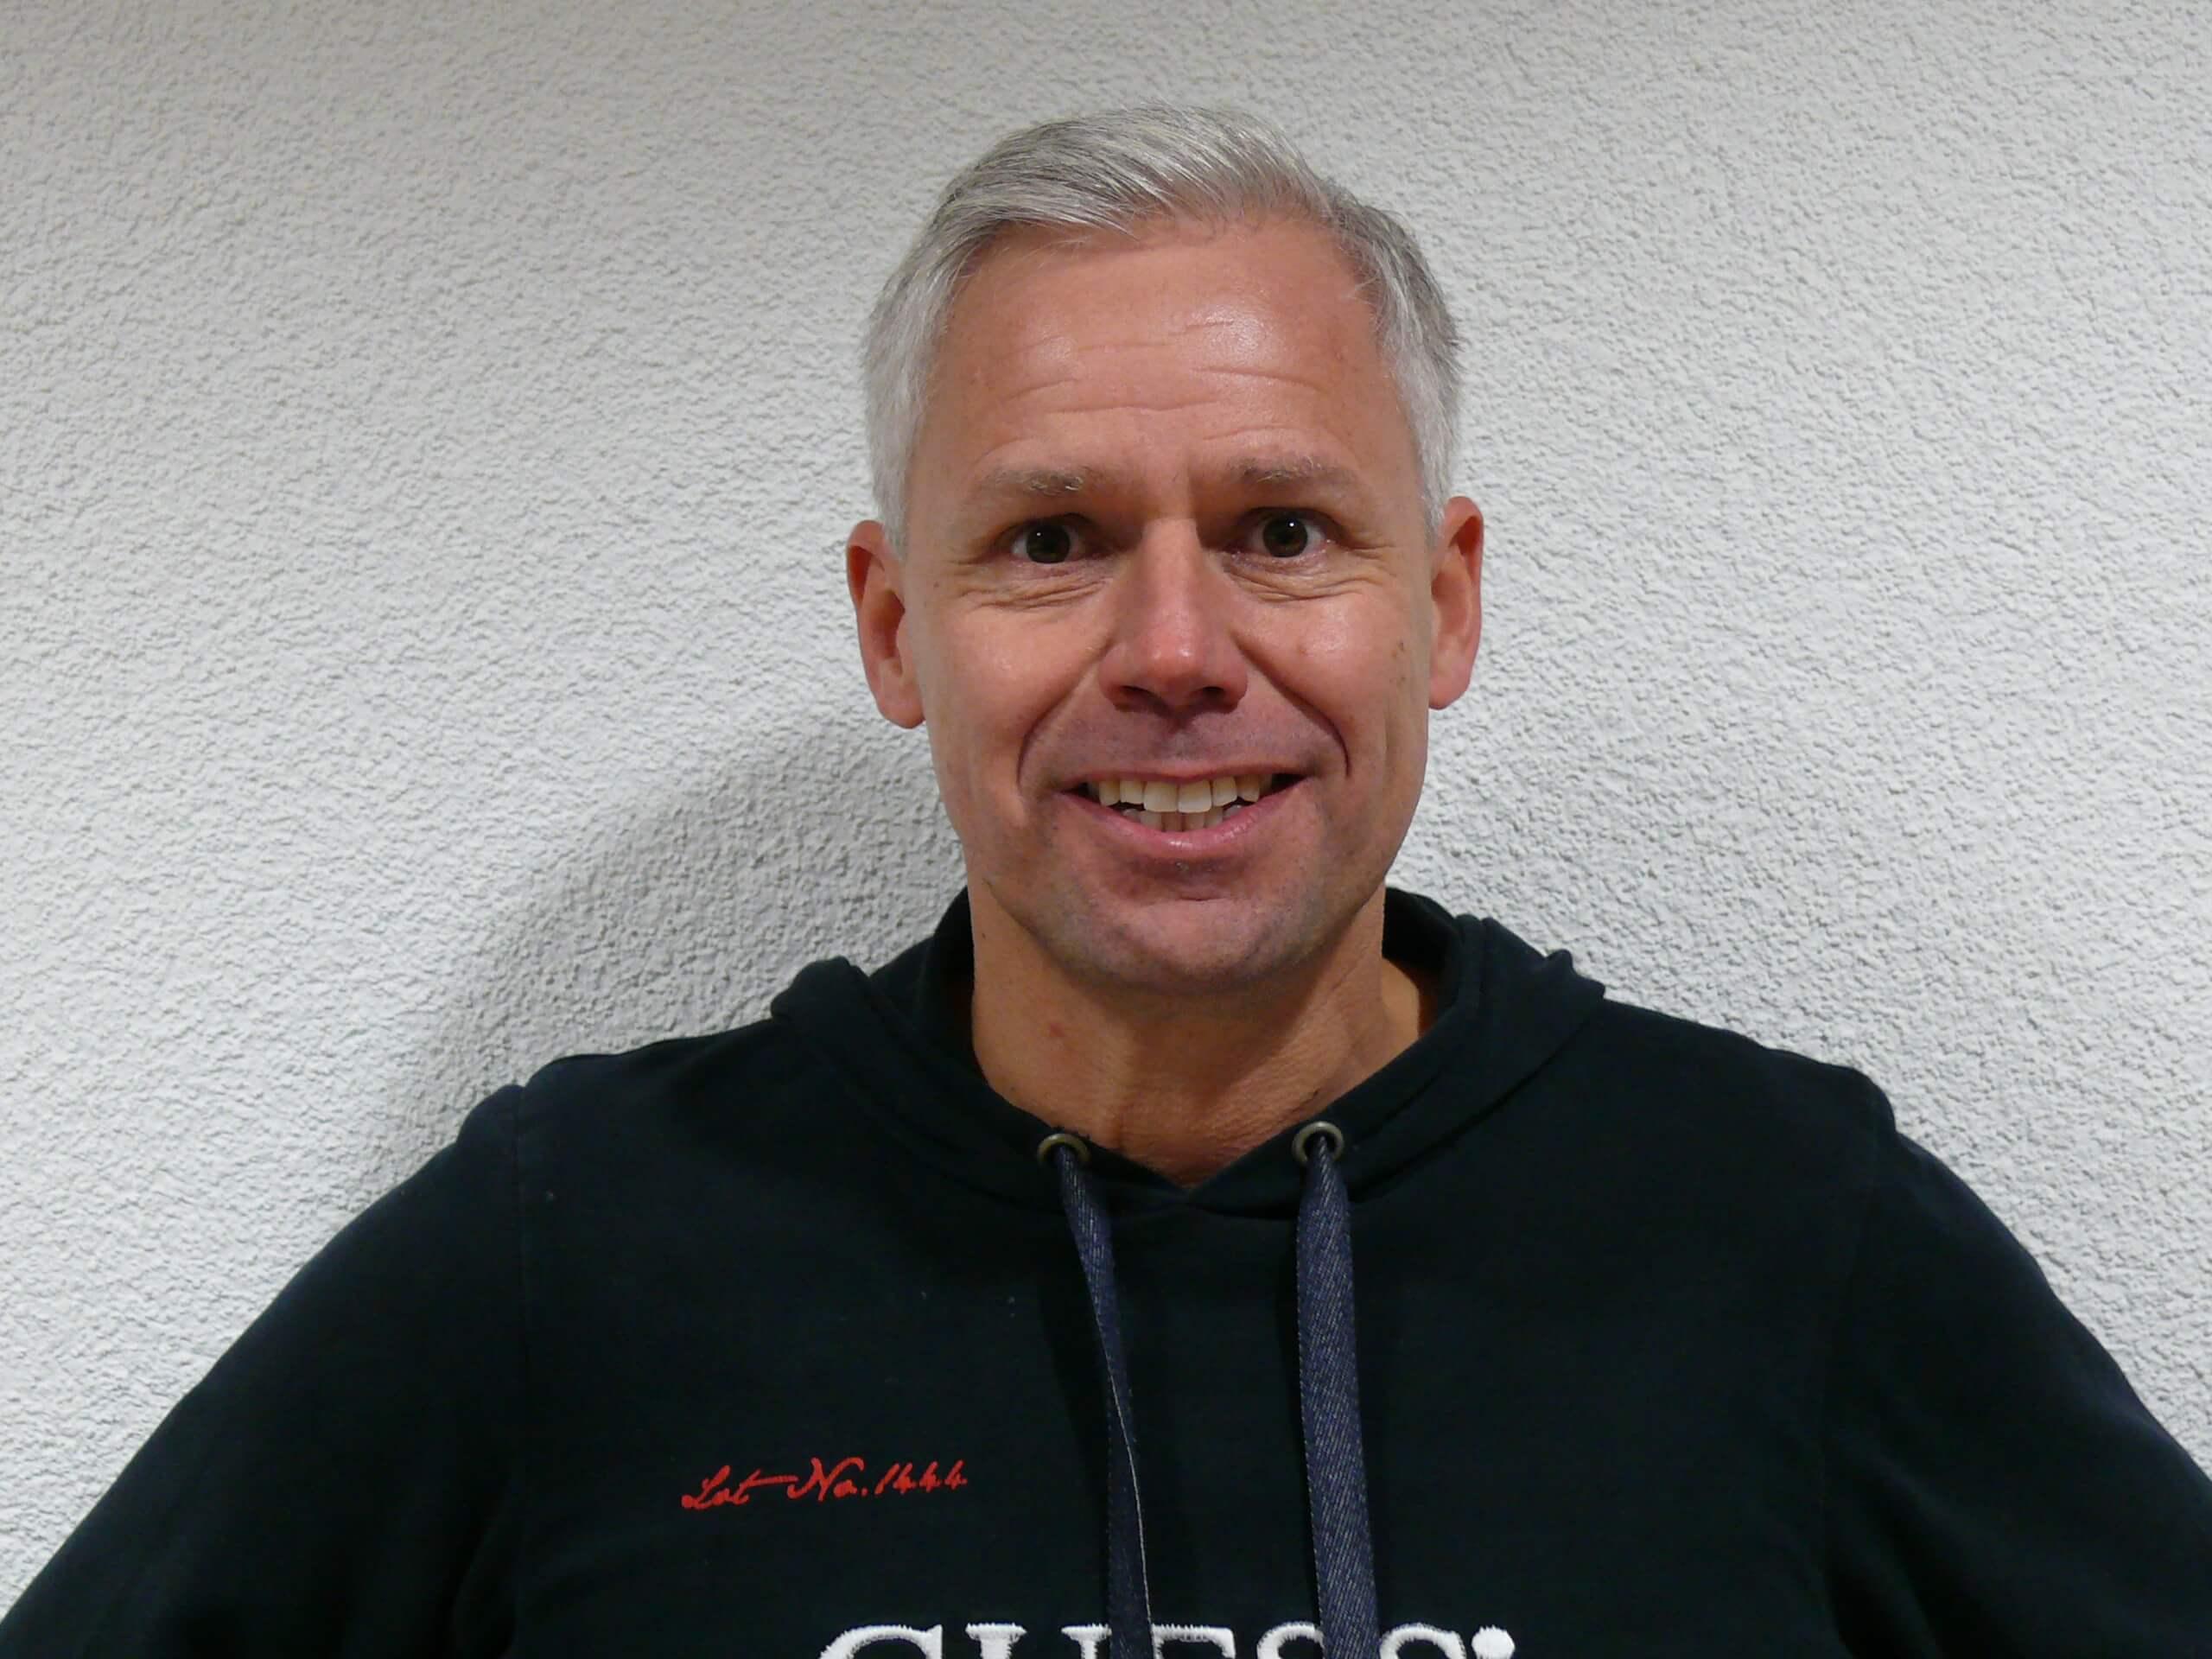 Matthias Kuehn